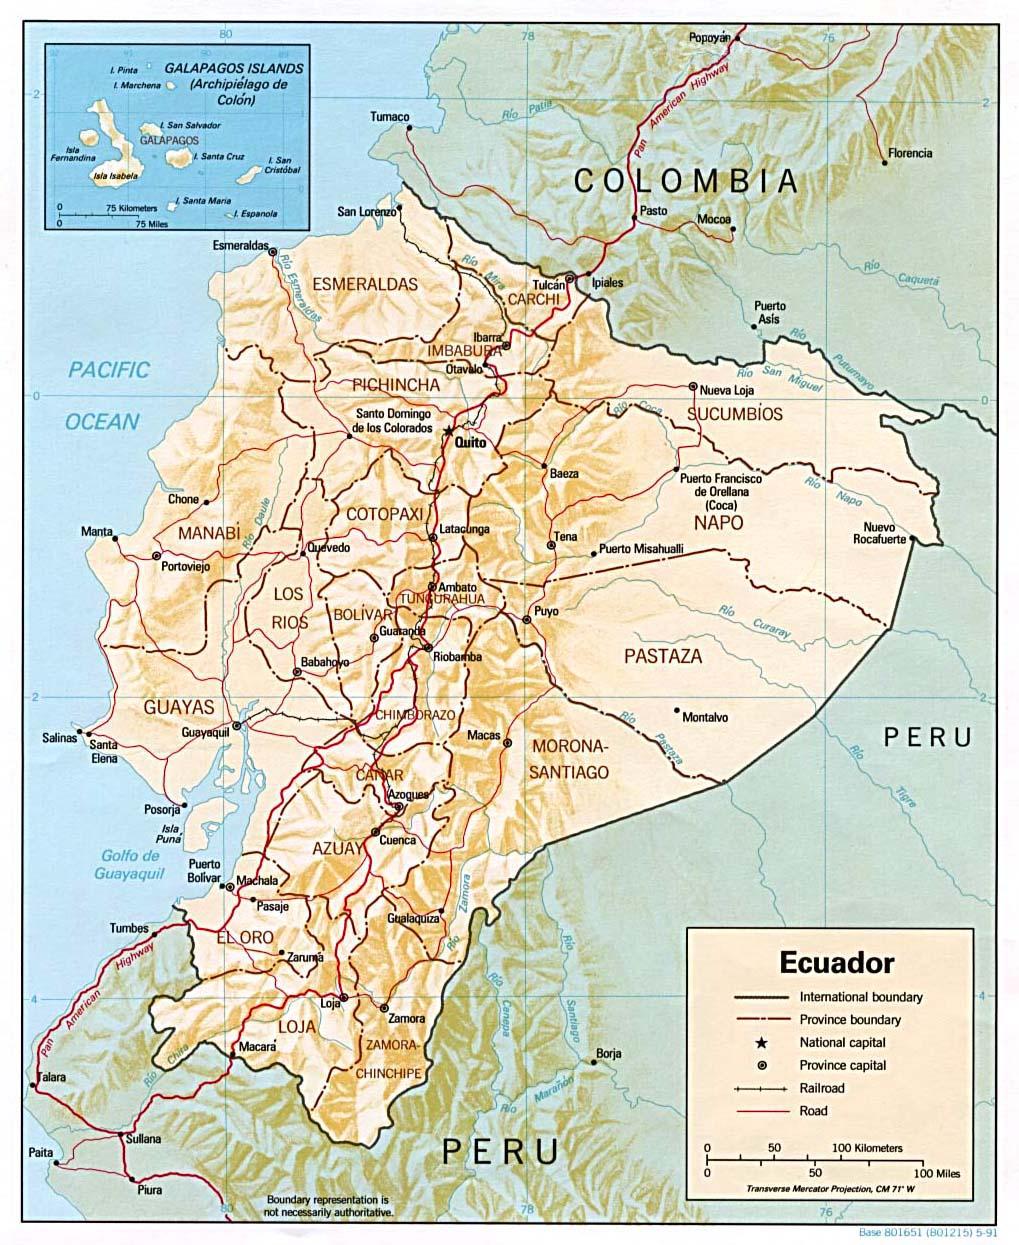 Map of Ecuador (Relief Map) : Weltkarte.com - Karten und Stadtpläne ...